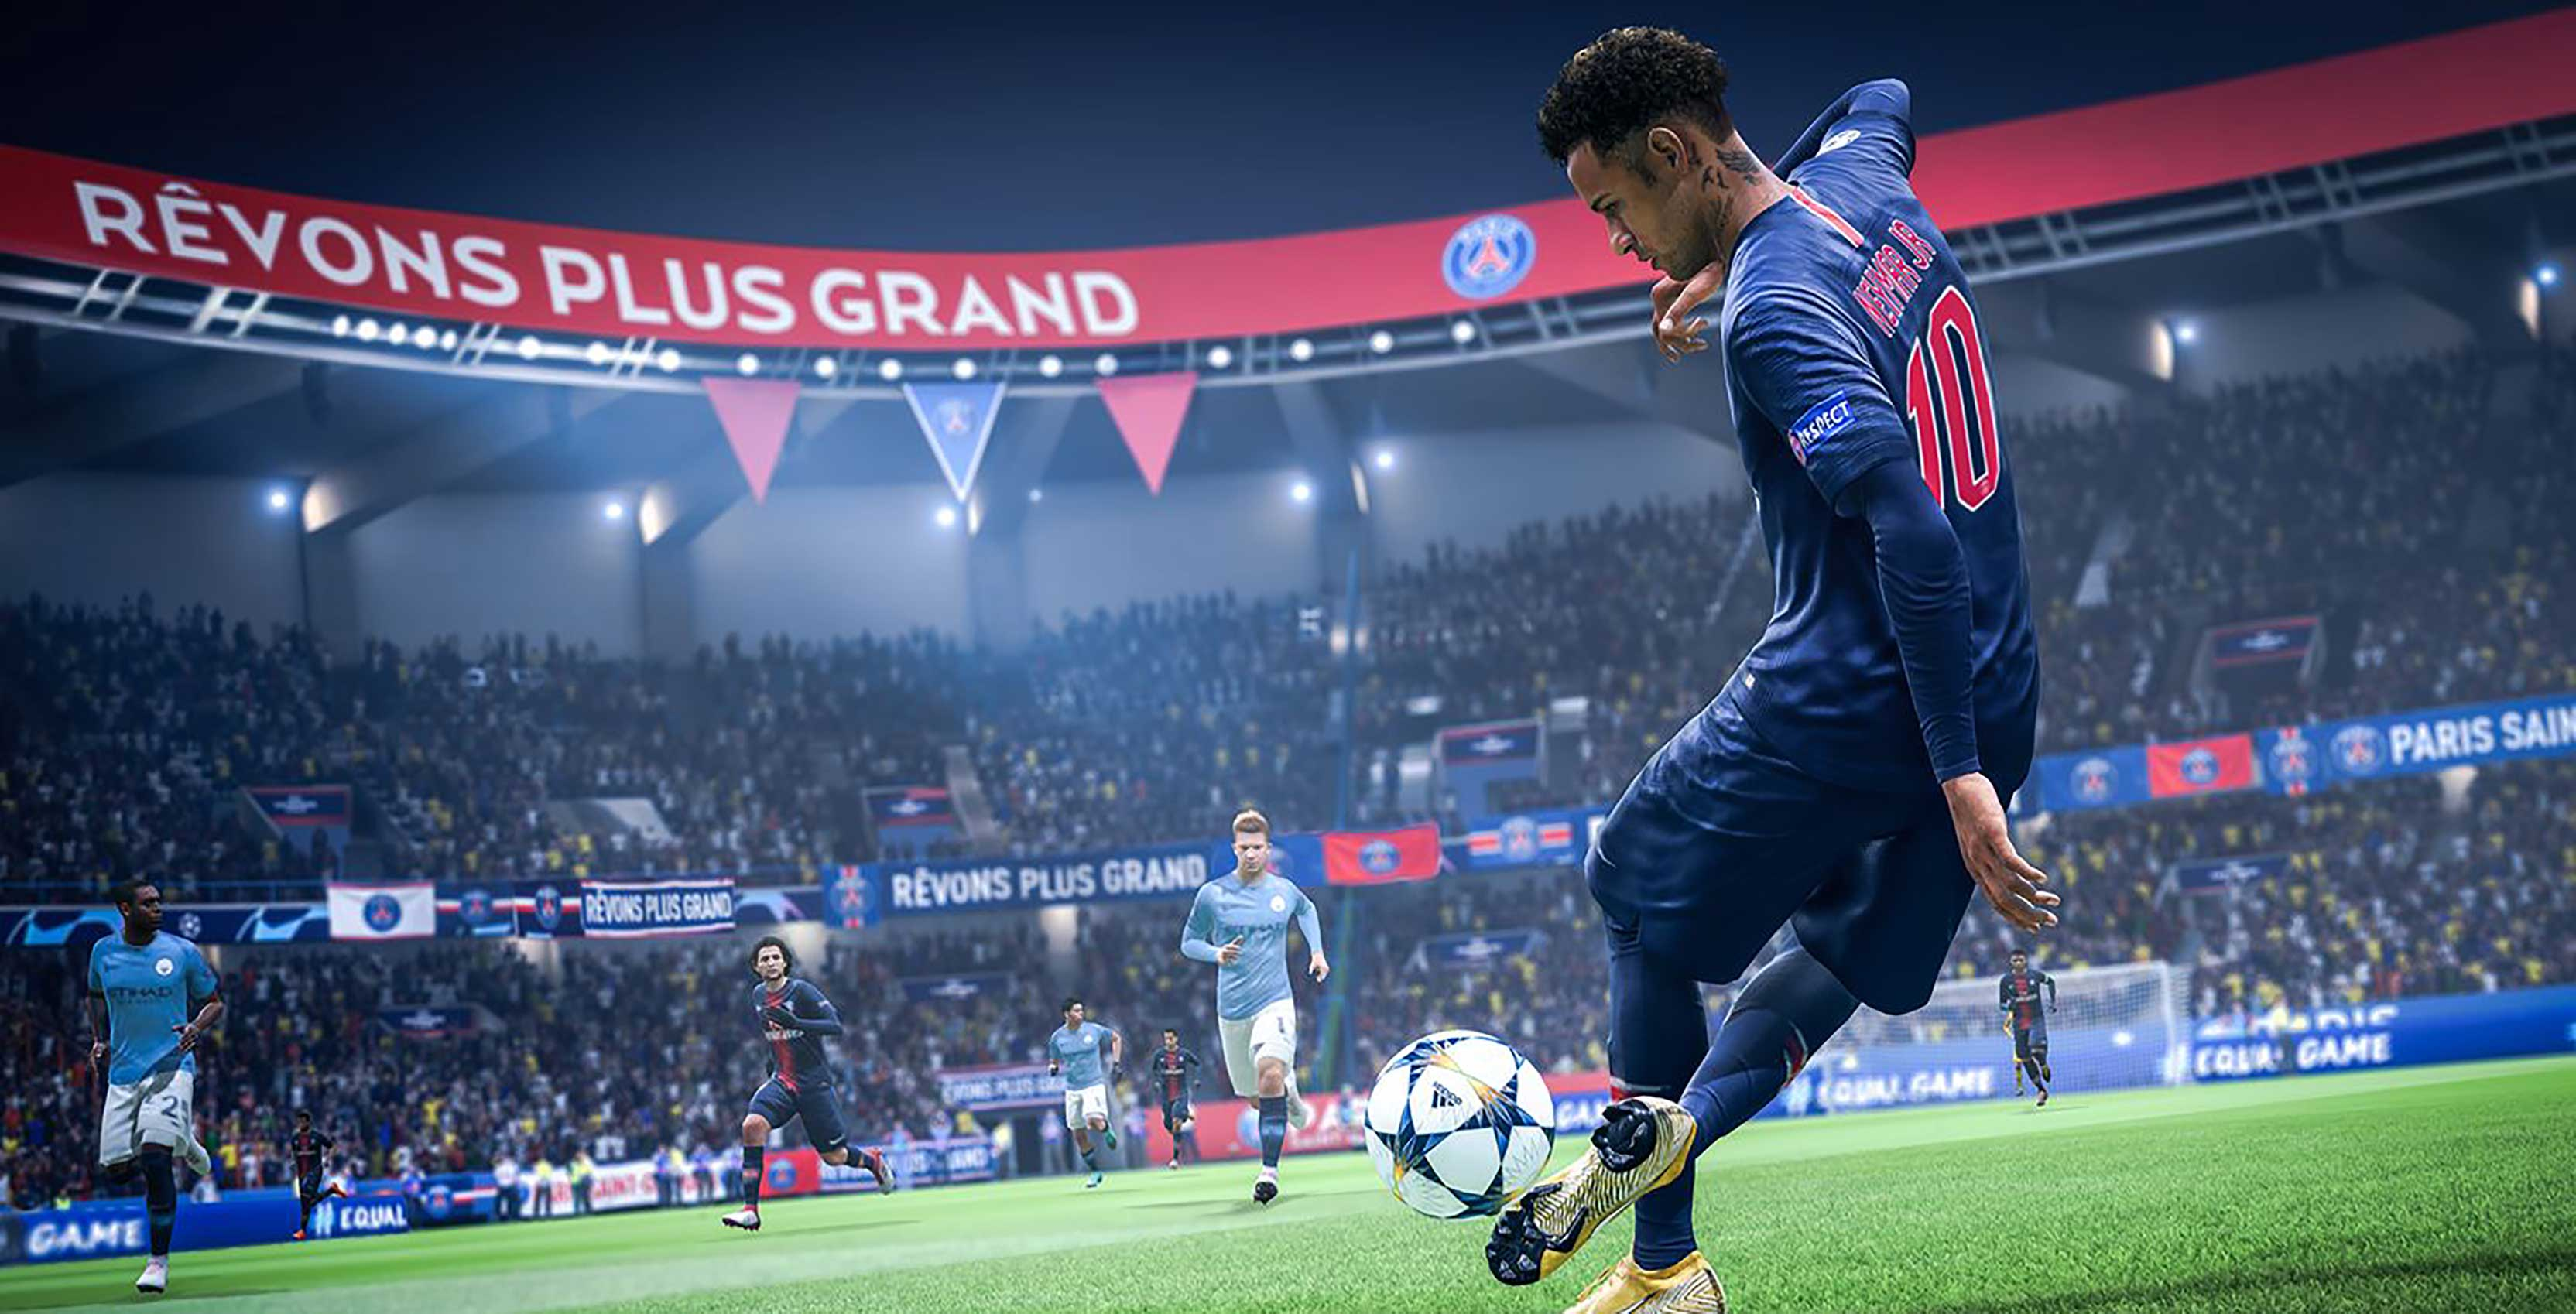 FIFA 19 Neymar Jr